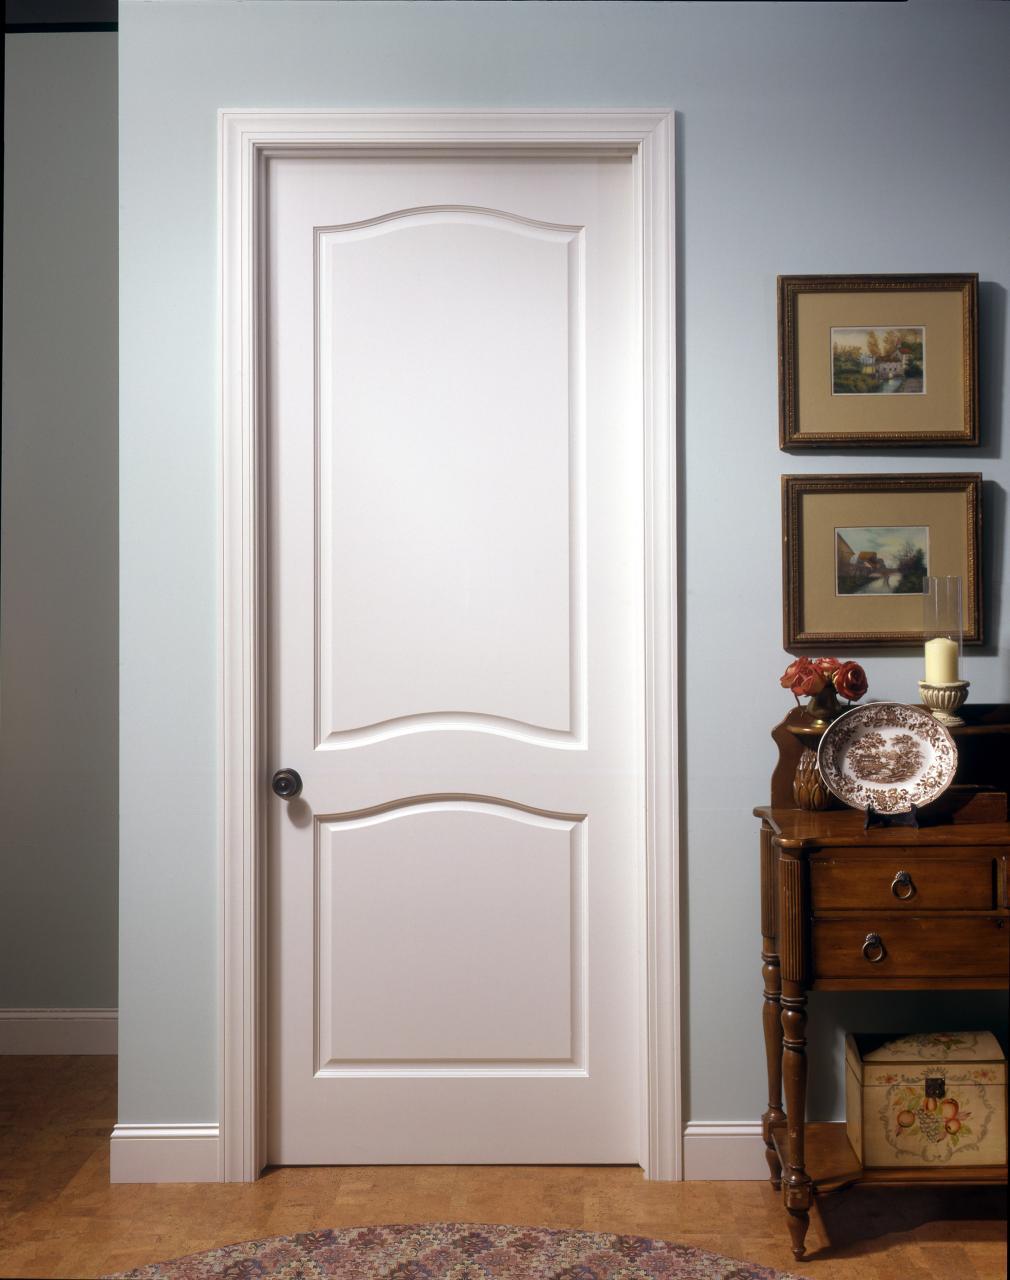 Trustile Paint Grade Mdf Interior Doors In Chicago At Glenview Haus Medium Density Fiberboard